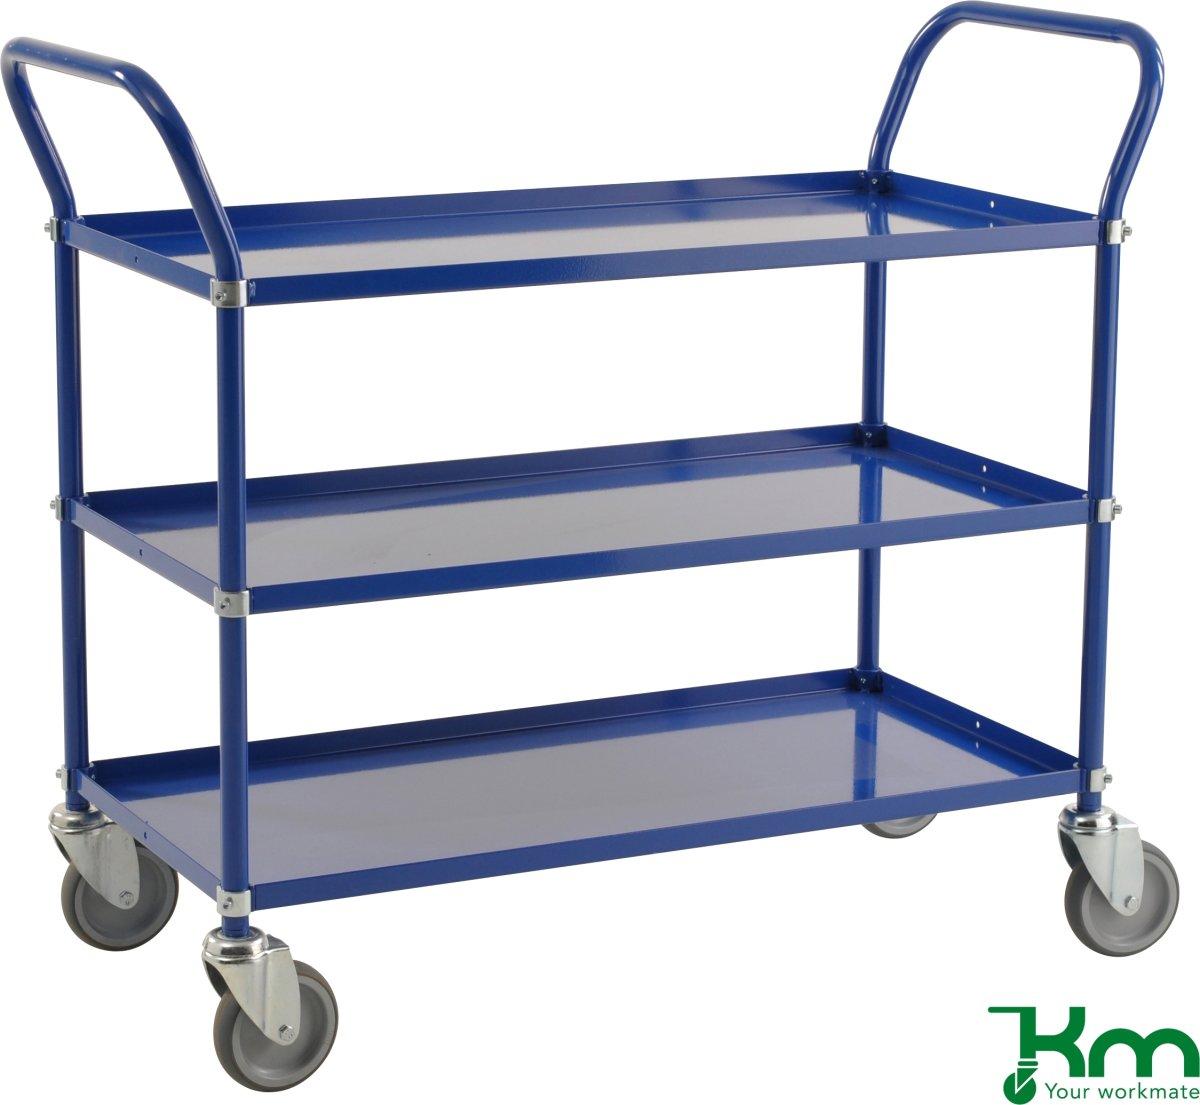 Rullebord 3 hylder, 1070x585x940 mm, 250kg, blå